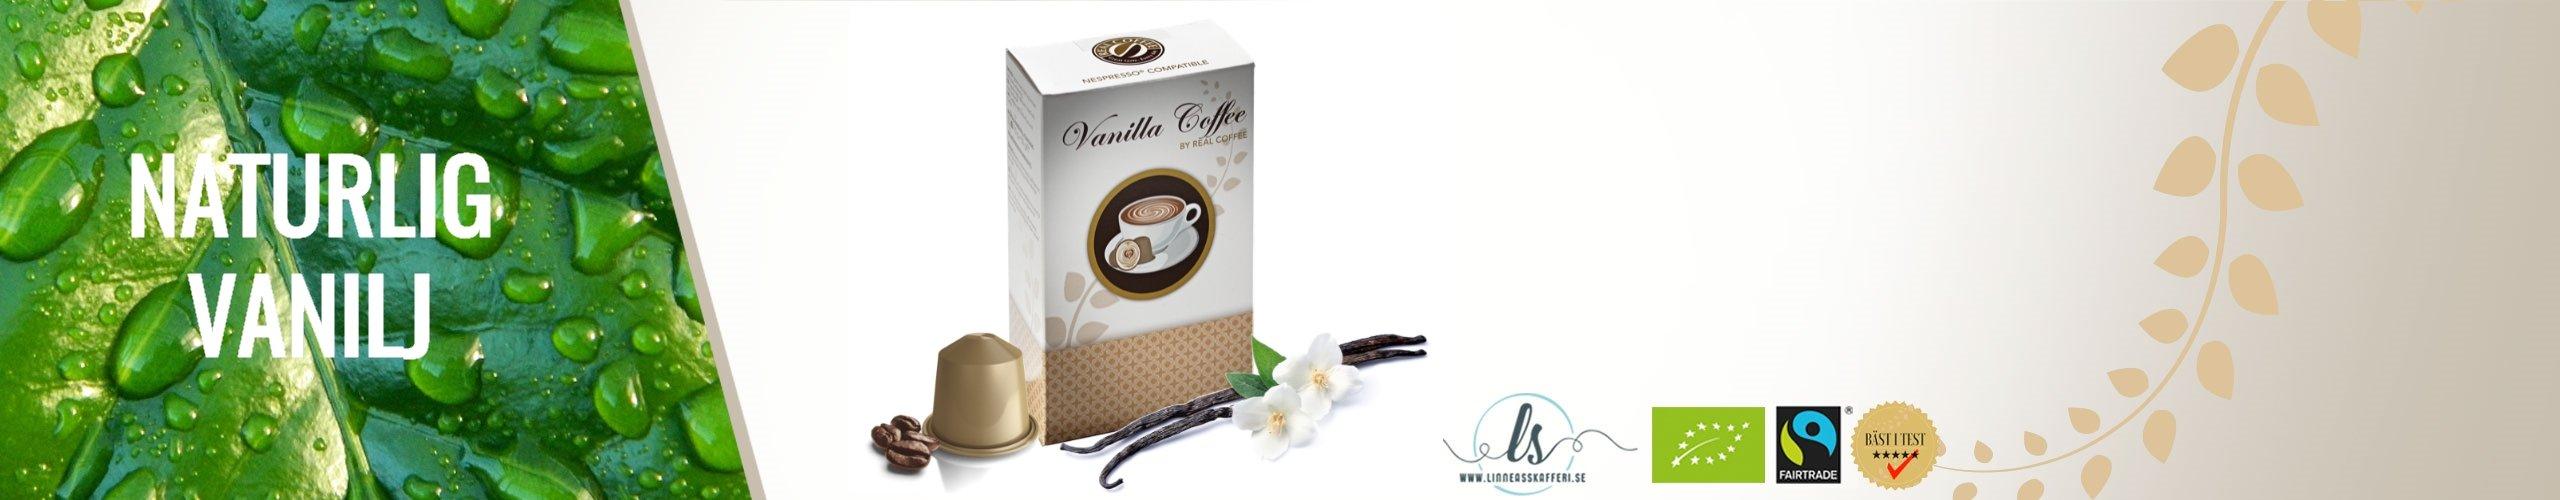 Espresso Vanilj